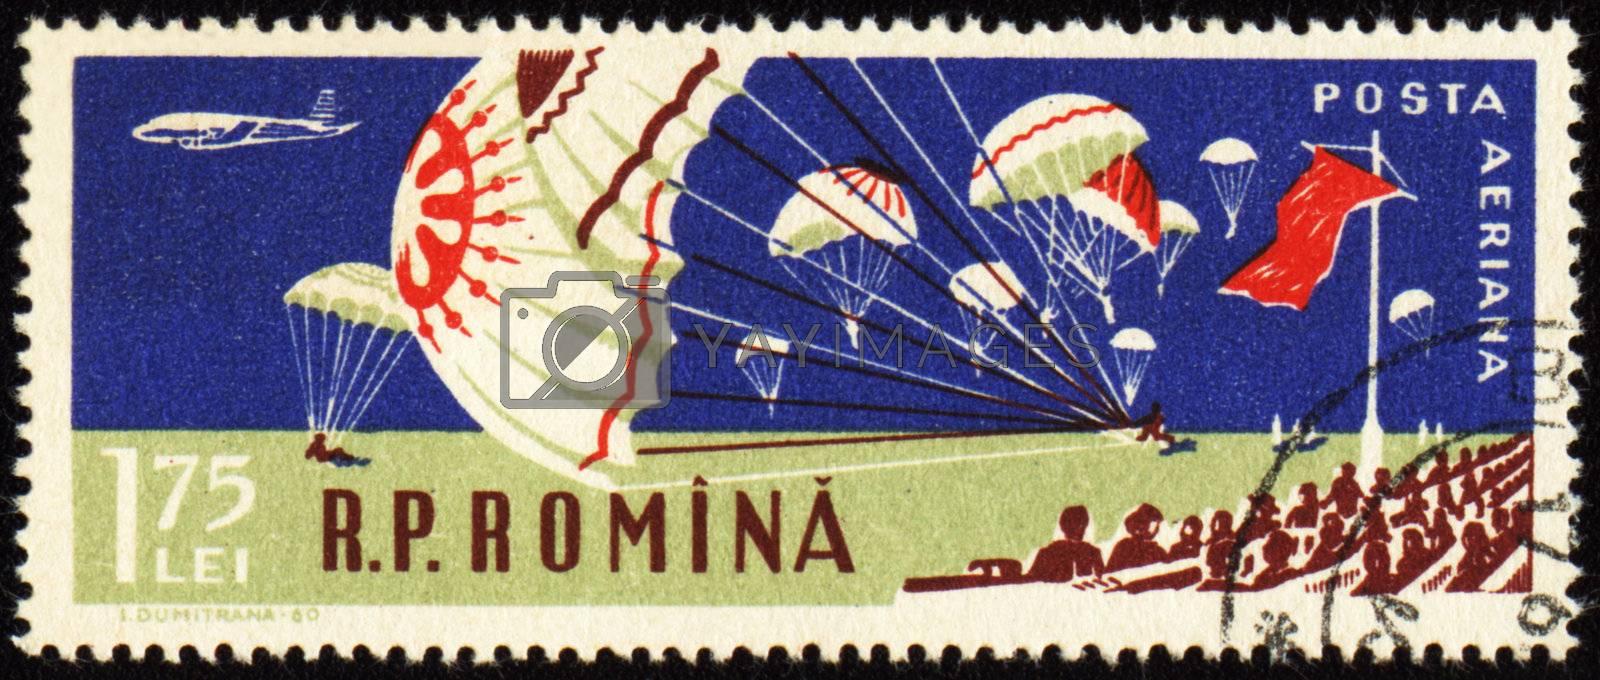 ROMANIA - CIRCA 1960: Parachutes at aviation sports event, landing in stadium, circa 1960